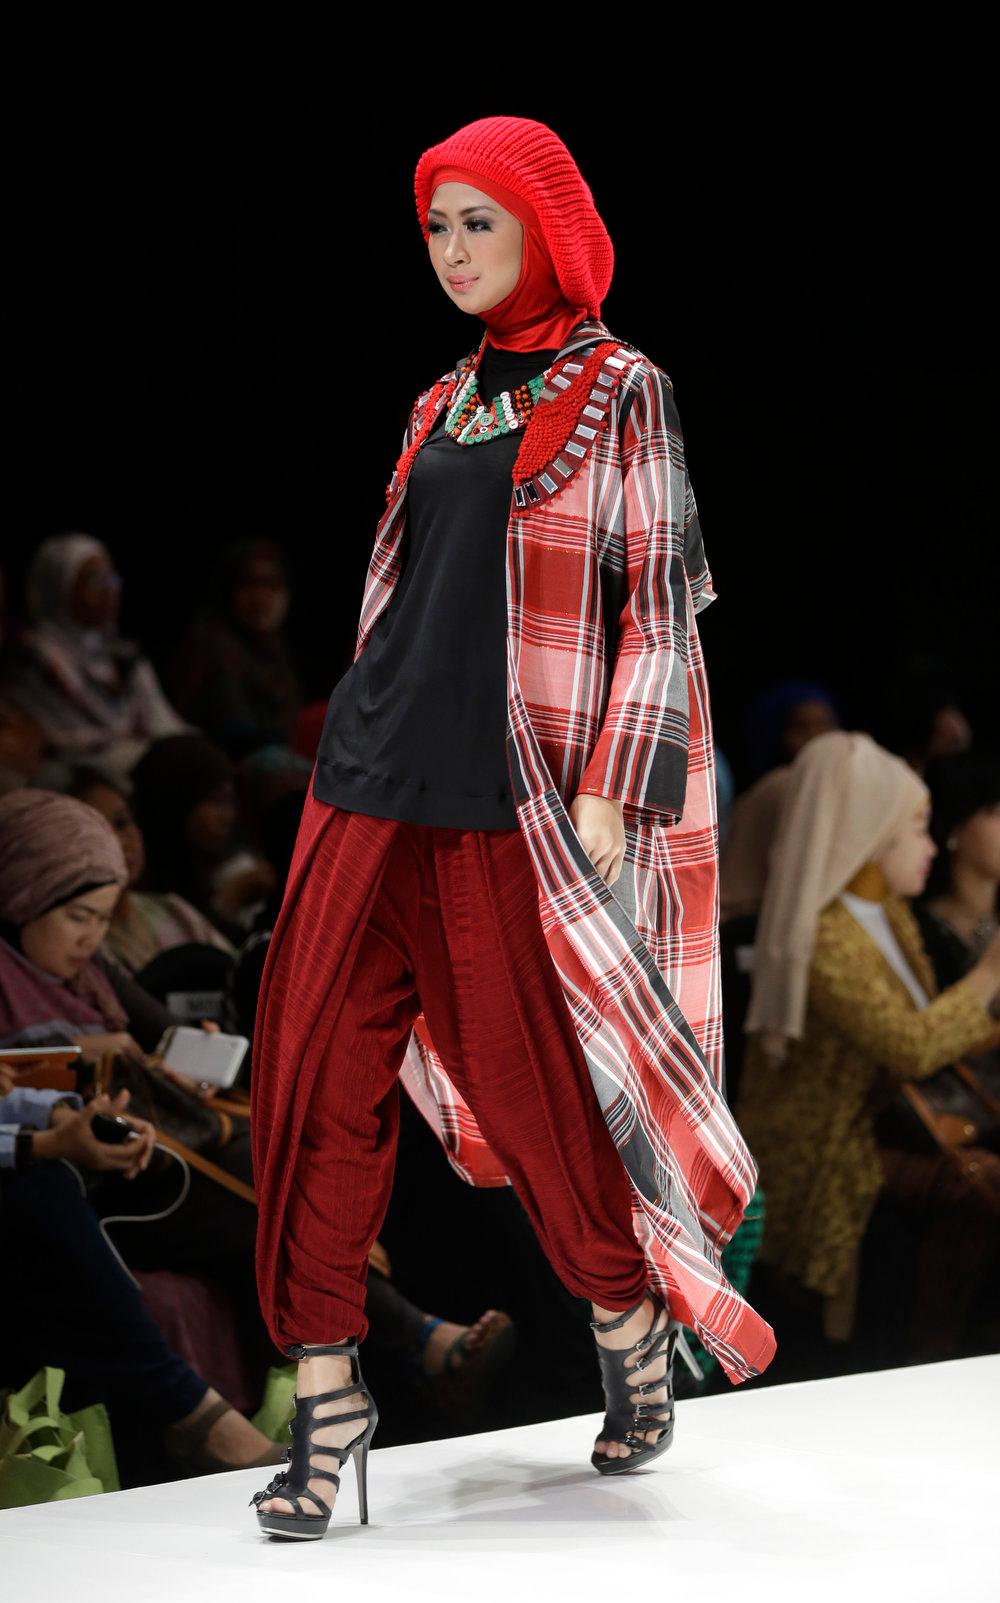 . A model displays a creation of Indonesian  designer Hannie Hananto during Indonesia Islamic Fashion Fair in Jakarta, Indonesia, Friday, May 31, 2013.  (AP Photo/Dita Alangkara)